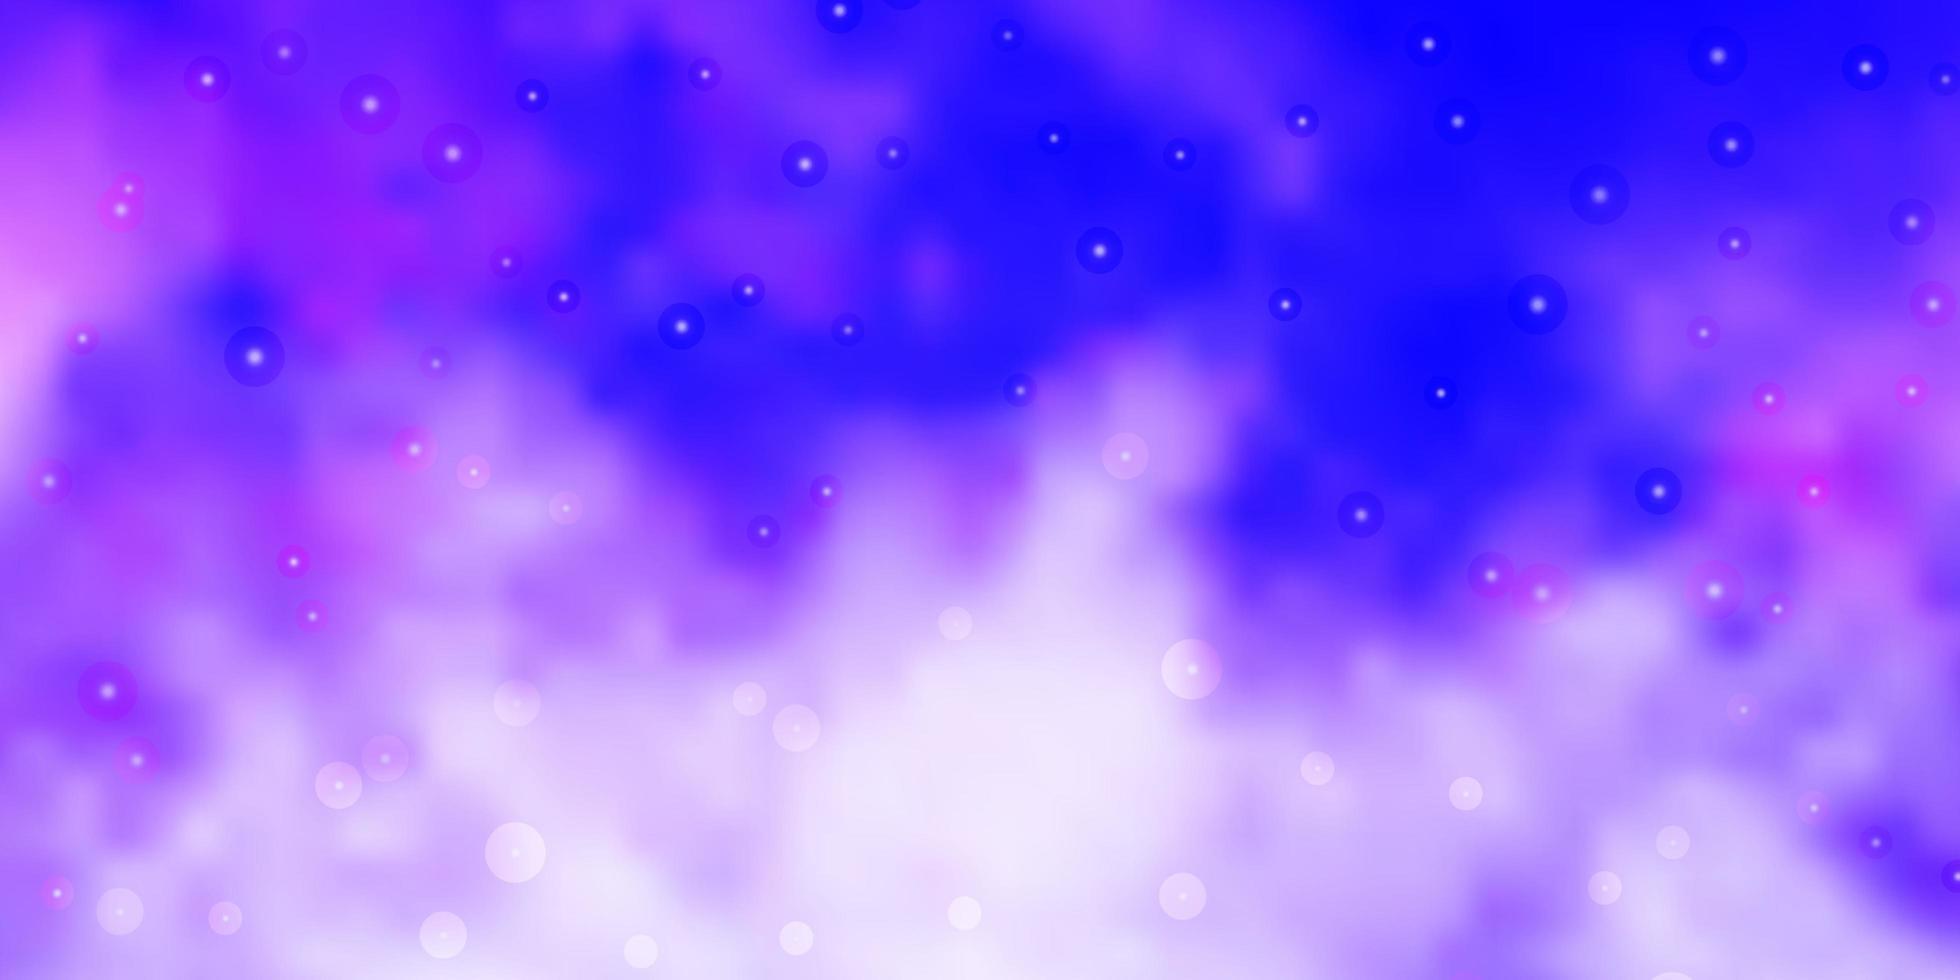 plantilla de vector púrpura claro con estrellas de neón.